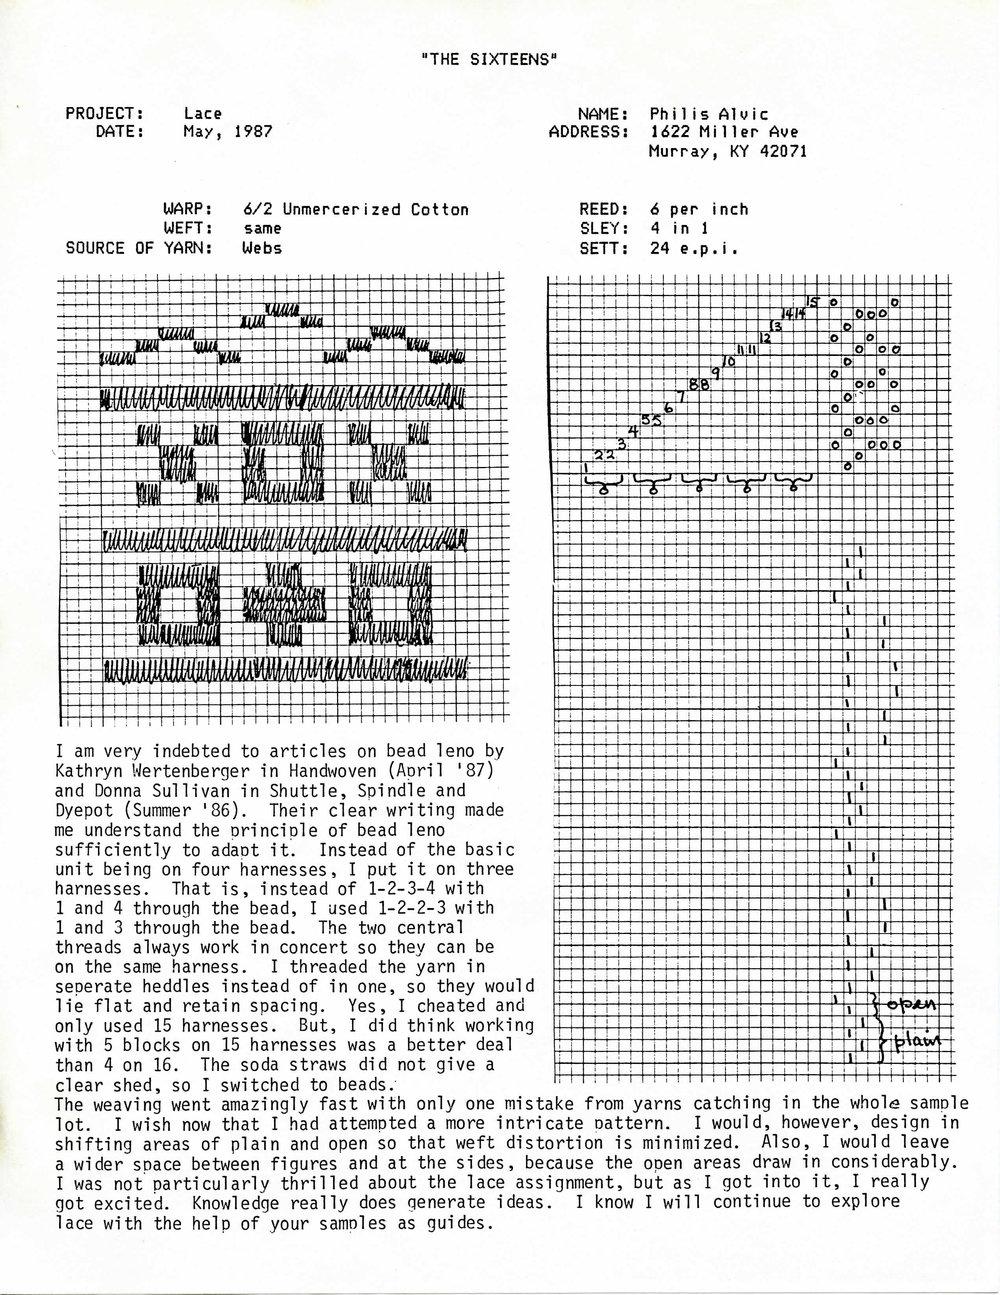 1987_Page_1_Image_0001.jpg